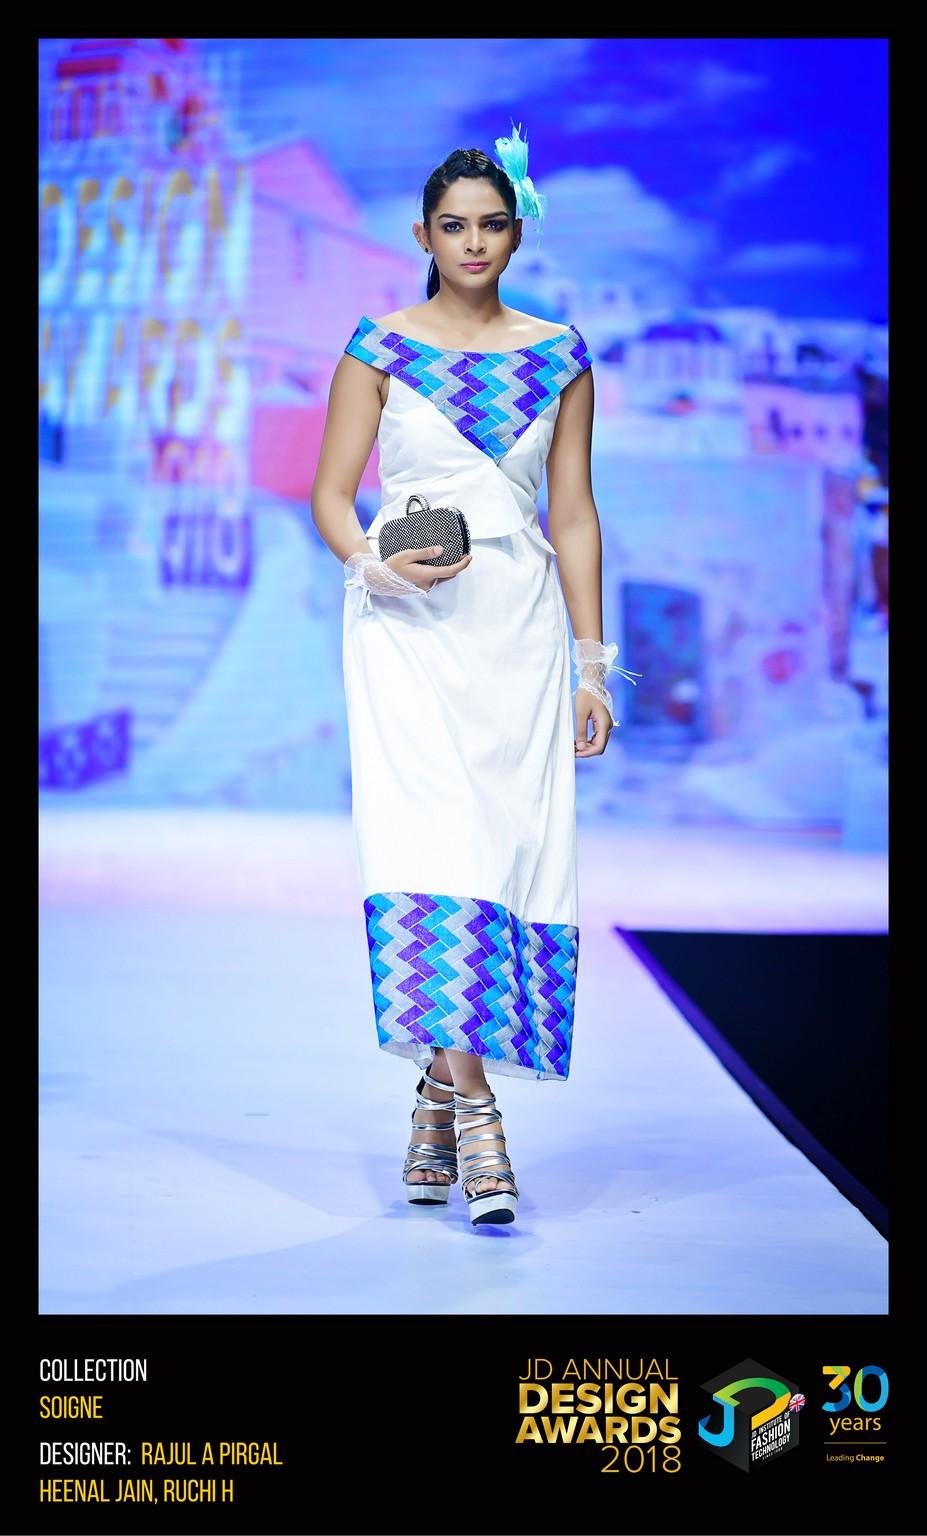 Soigne – Change – JD Annual Design Awards 2018 | Designer: Rajul, Heena and Ruchi | Photography : Jerin Nath (@jerin_nath) soigne – change – jd annual design awards 2018 - SOIGNE 3 - Soigne – Change – JD Annual Design Awards 2018